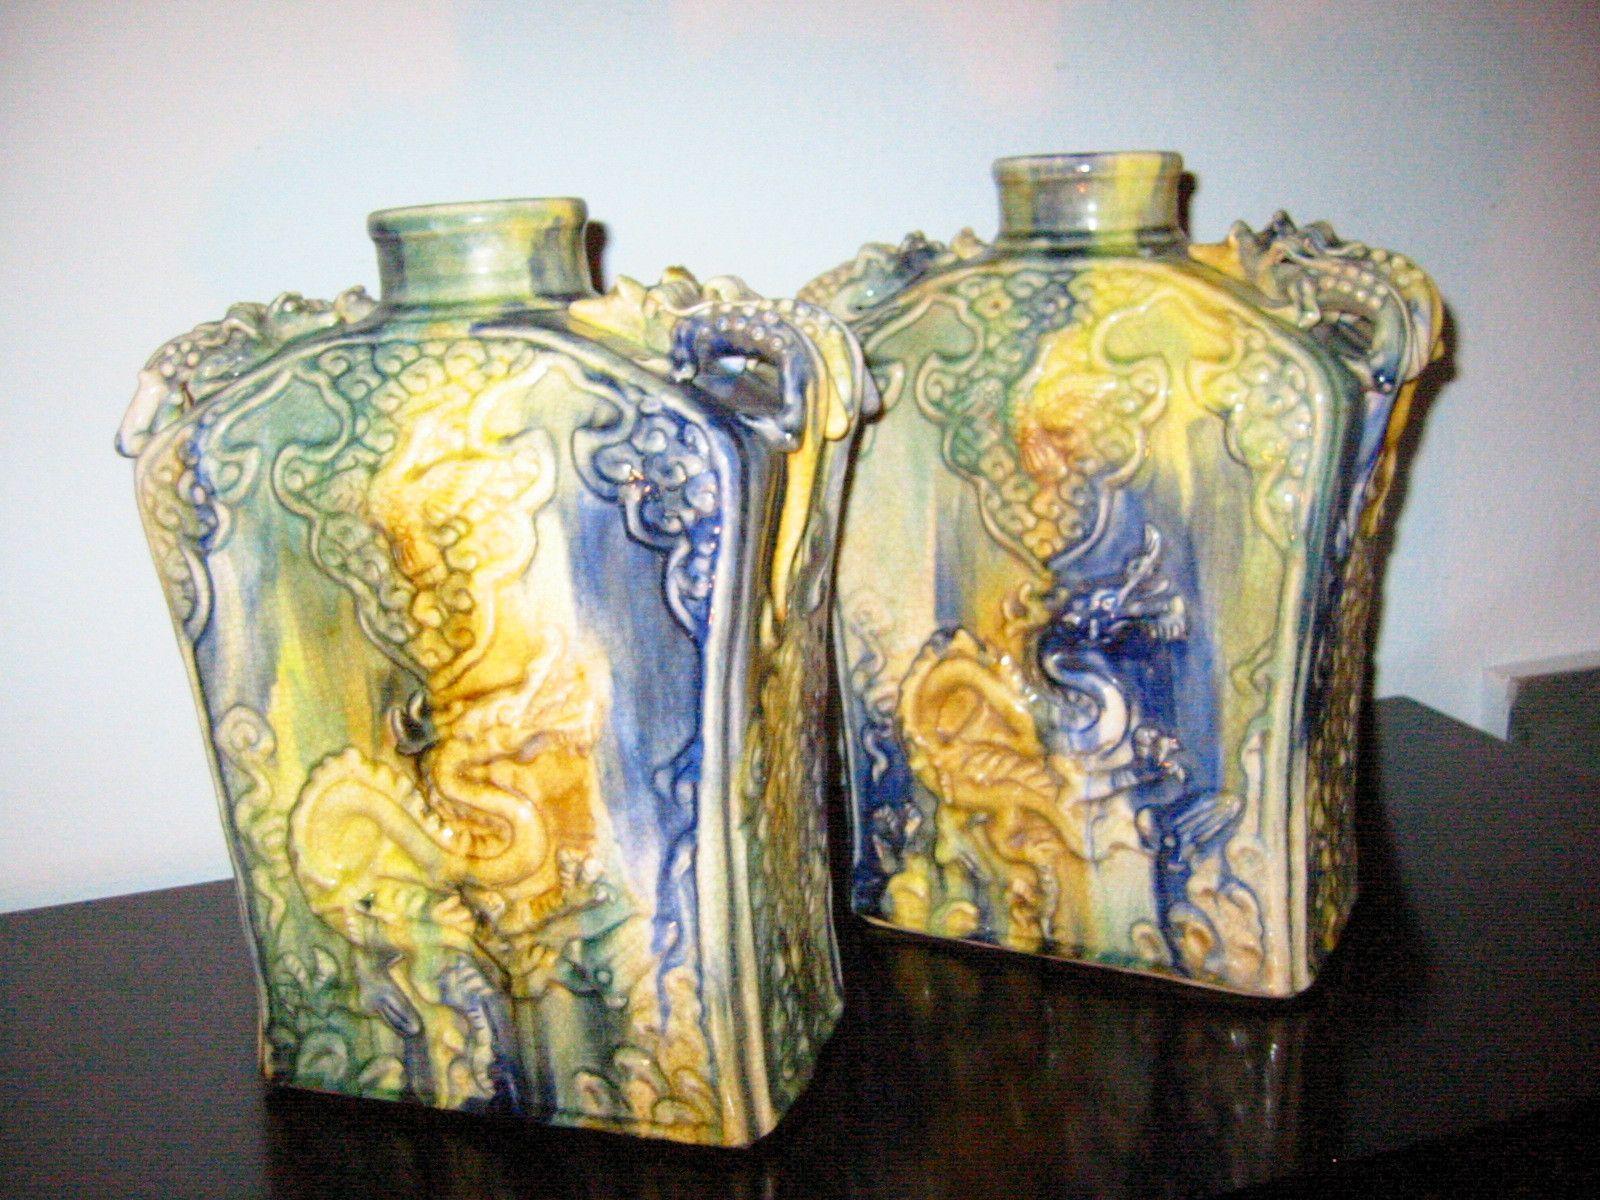 Asian Majolica Ceramic Vases Vessels Decorated Swirl Dragons